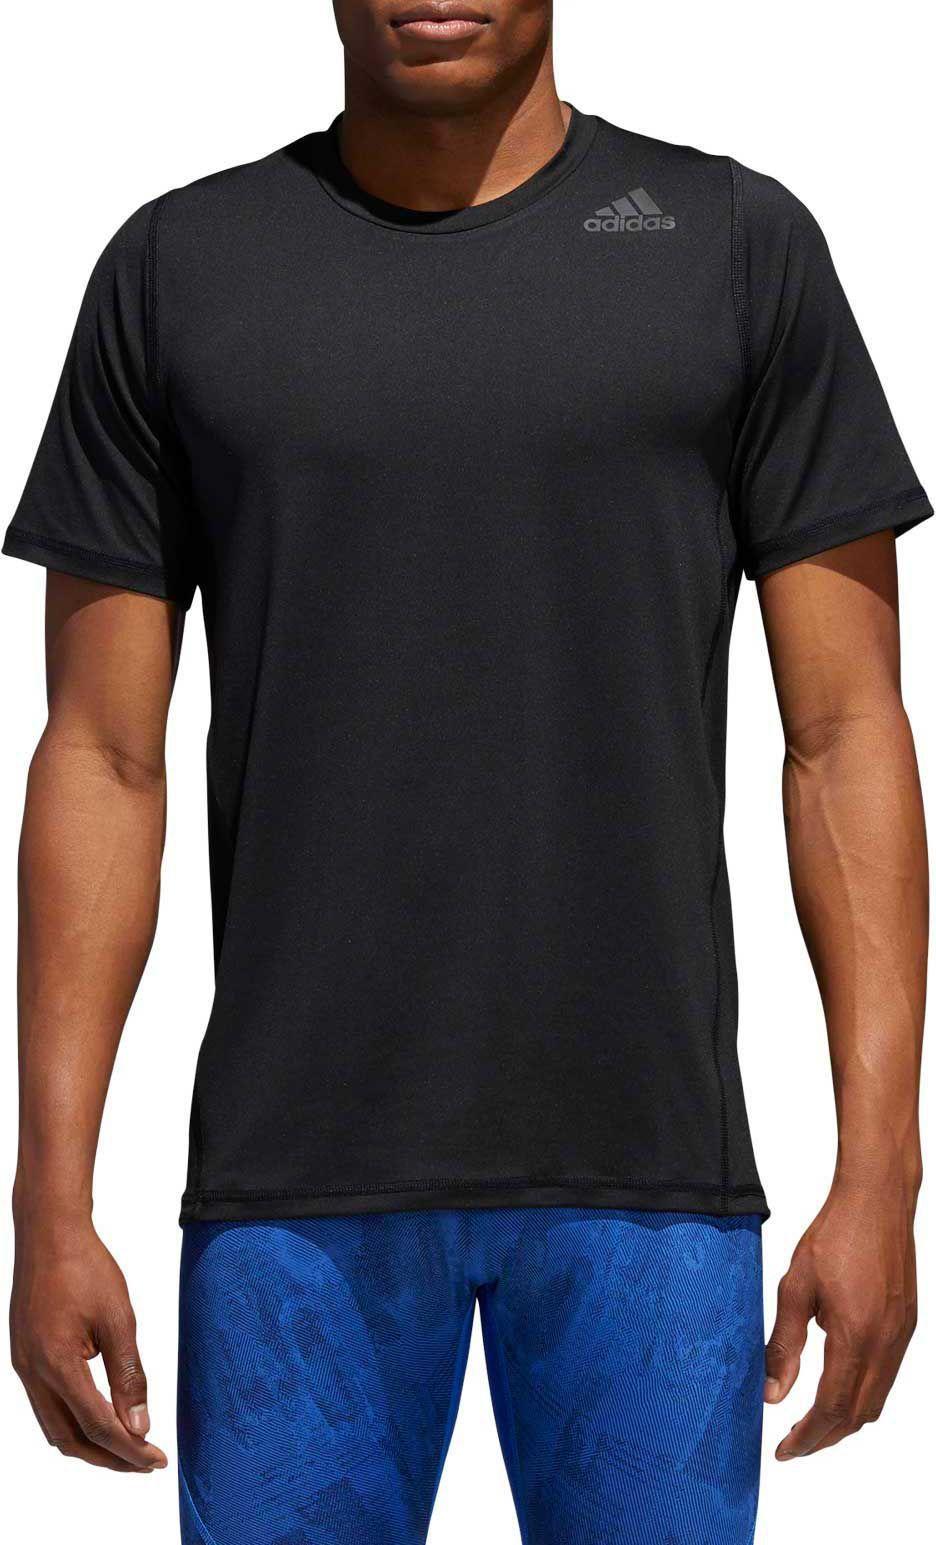 e0f62d6eeb25 adidas Men s Alphaskin Sport Fitted Training T-Shirt